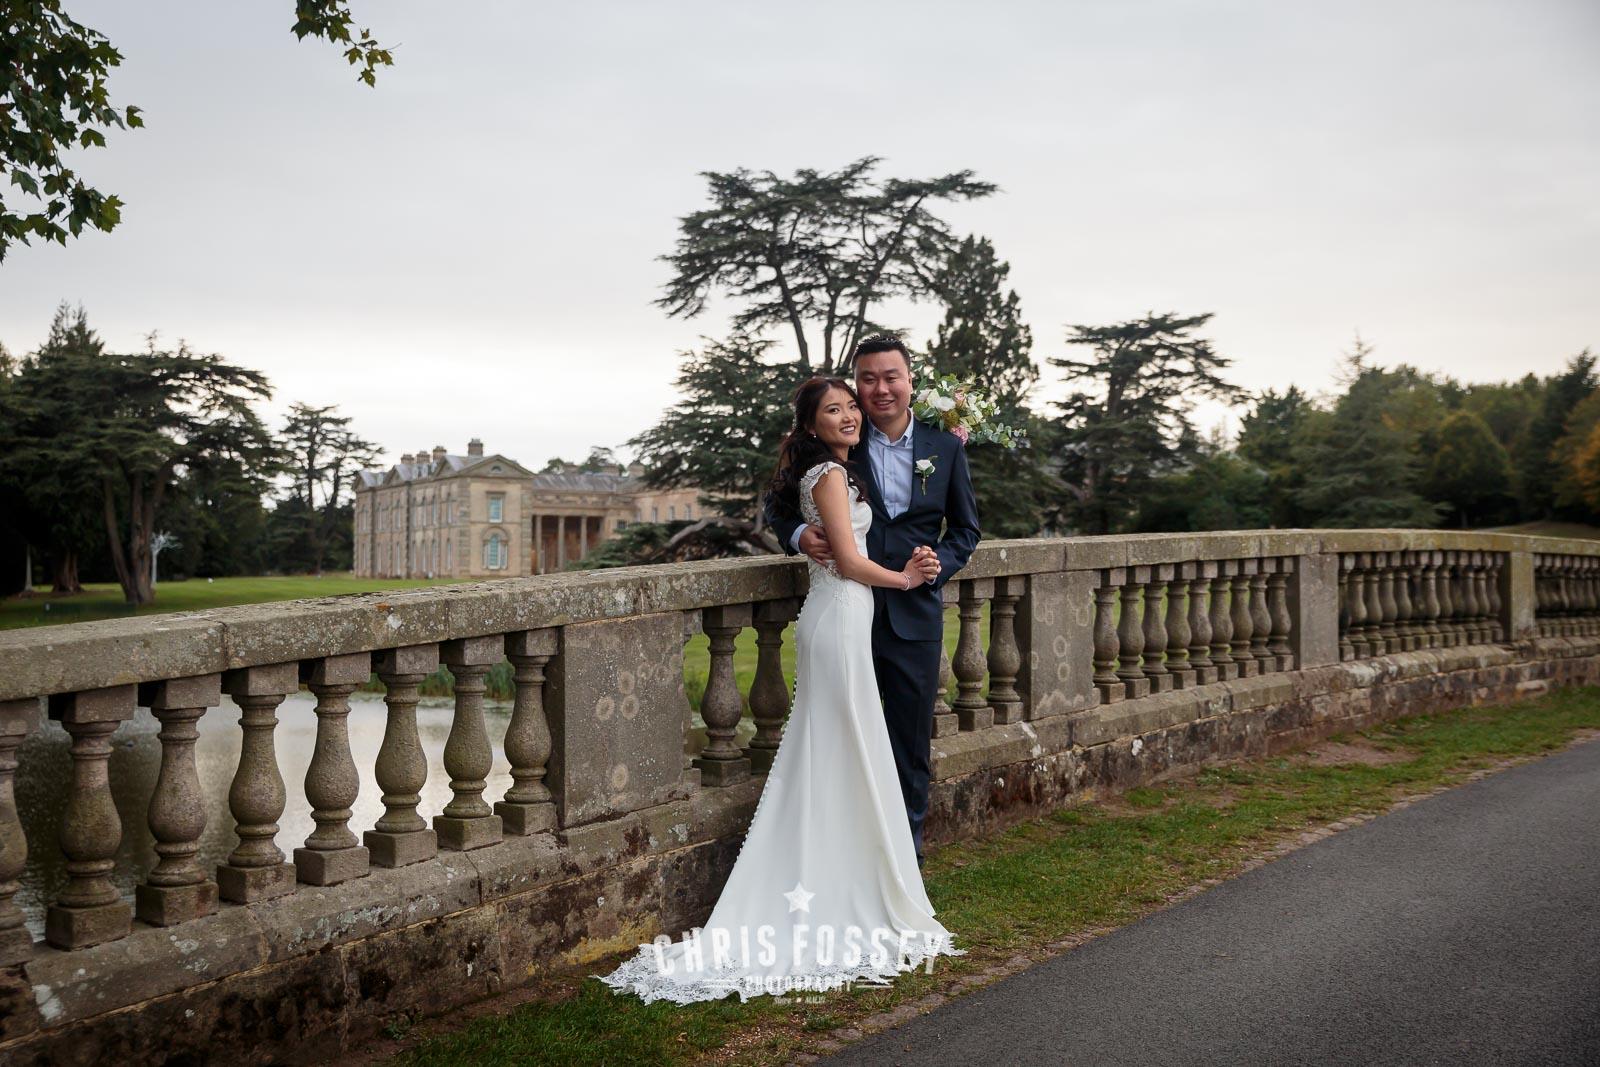 Compton Verney Stratford Warwickshire Wedding Photographer by Chris Fossey Photography